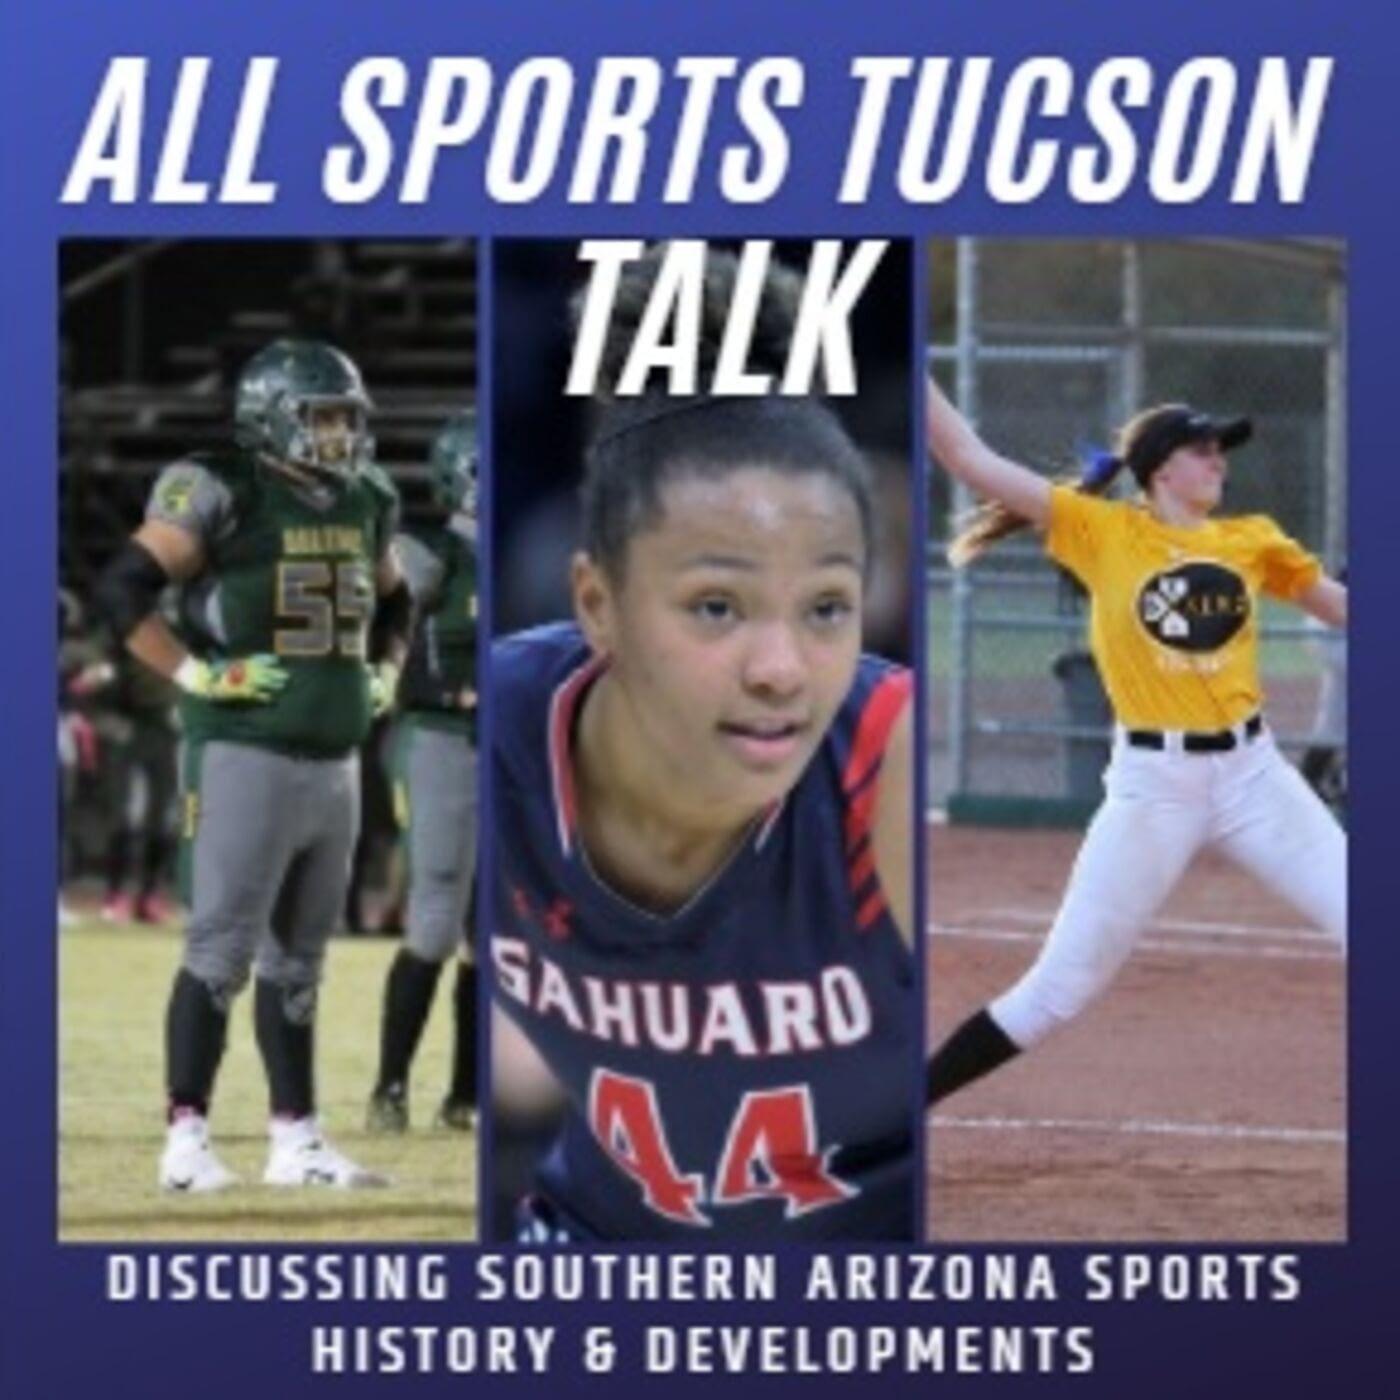 Southern Arizona Coaching Memories with Mountain View football coach Matt Johnson